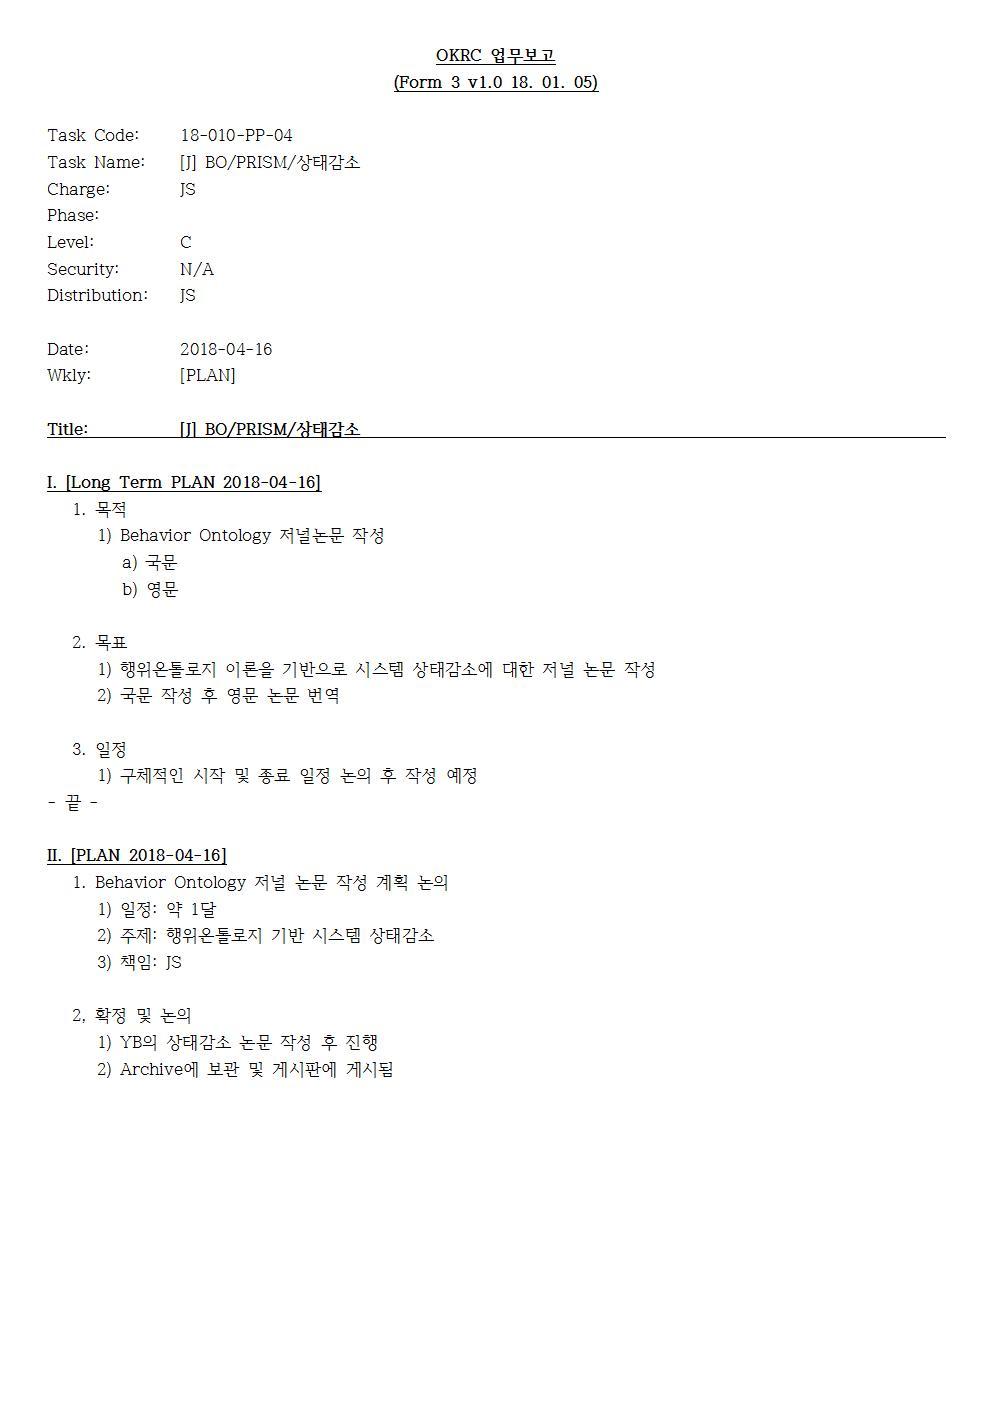 D-[18-010-PP-04]-[J-BO-PRISM-Stateminimization]-[2018-04-16][JS]001.jpg